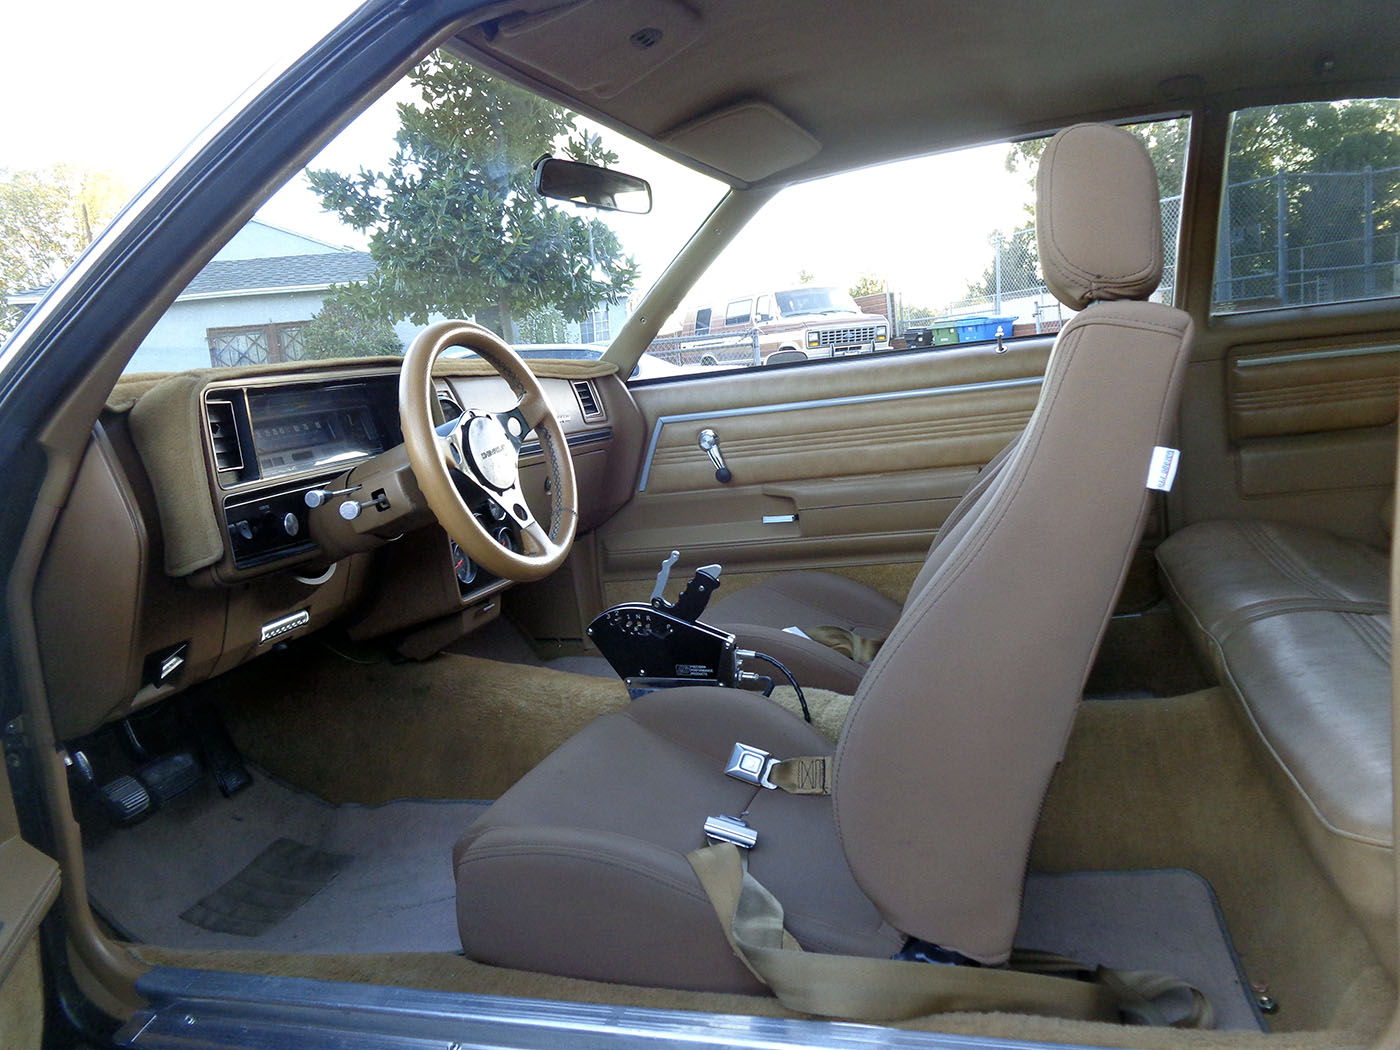 Malibu 1980 chevrolet malibu listings : For Sale: 1980 Chevy Malibu with a Turbo LSx – Engine Swap Depot